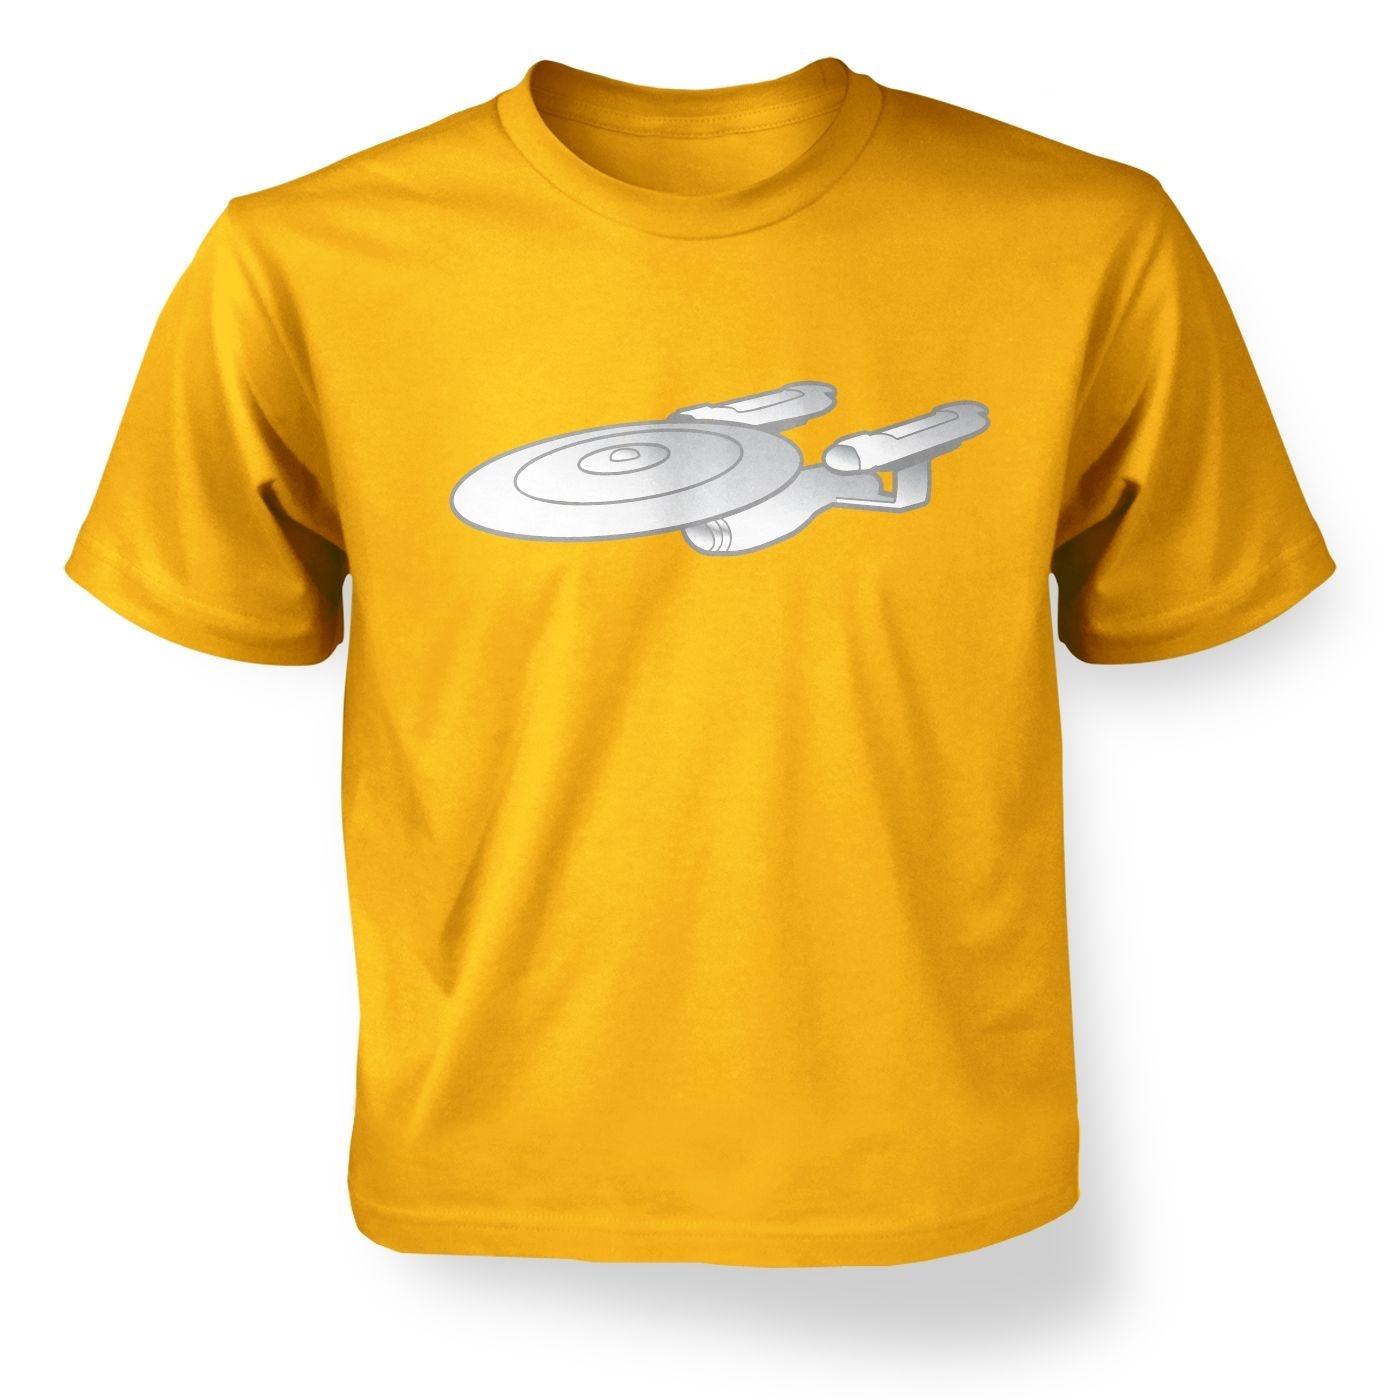 Silver Starship Enterprise kids' t-shirt